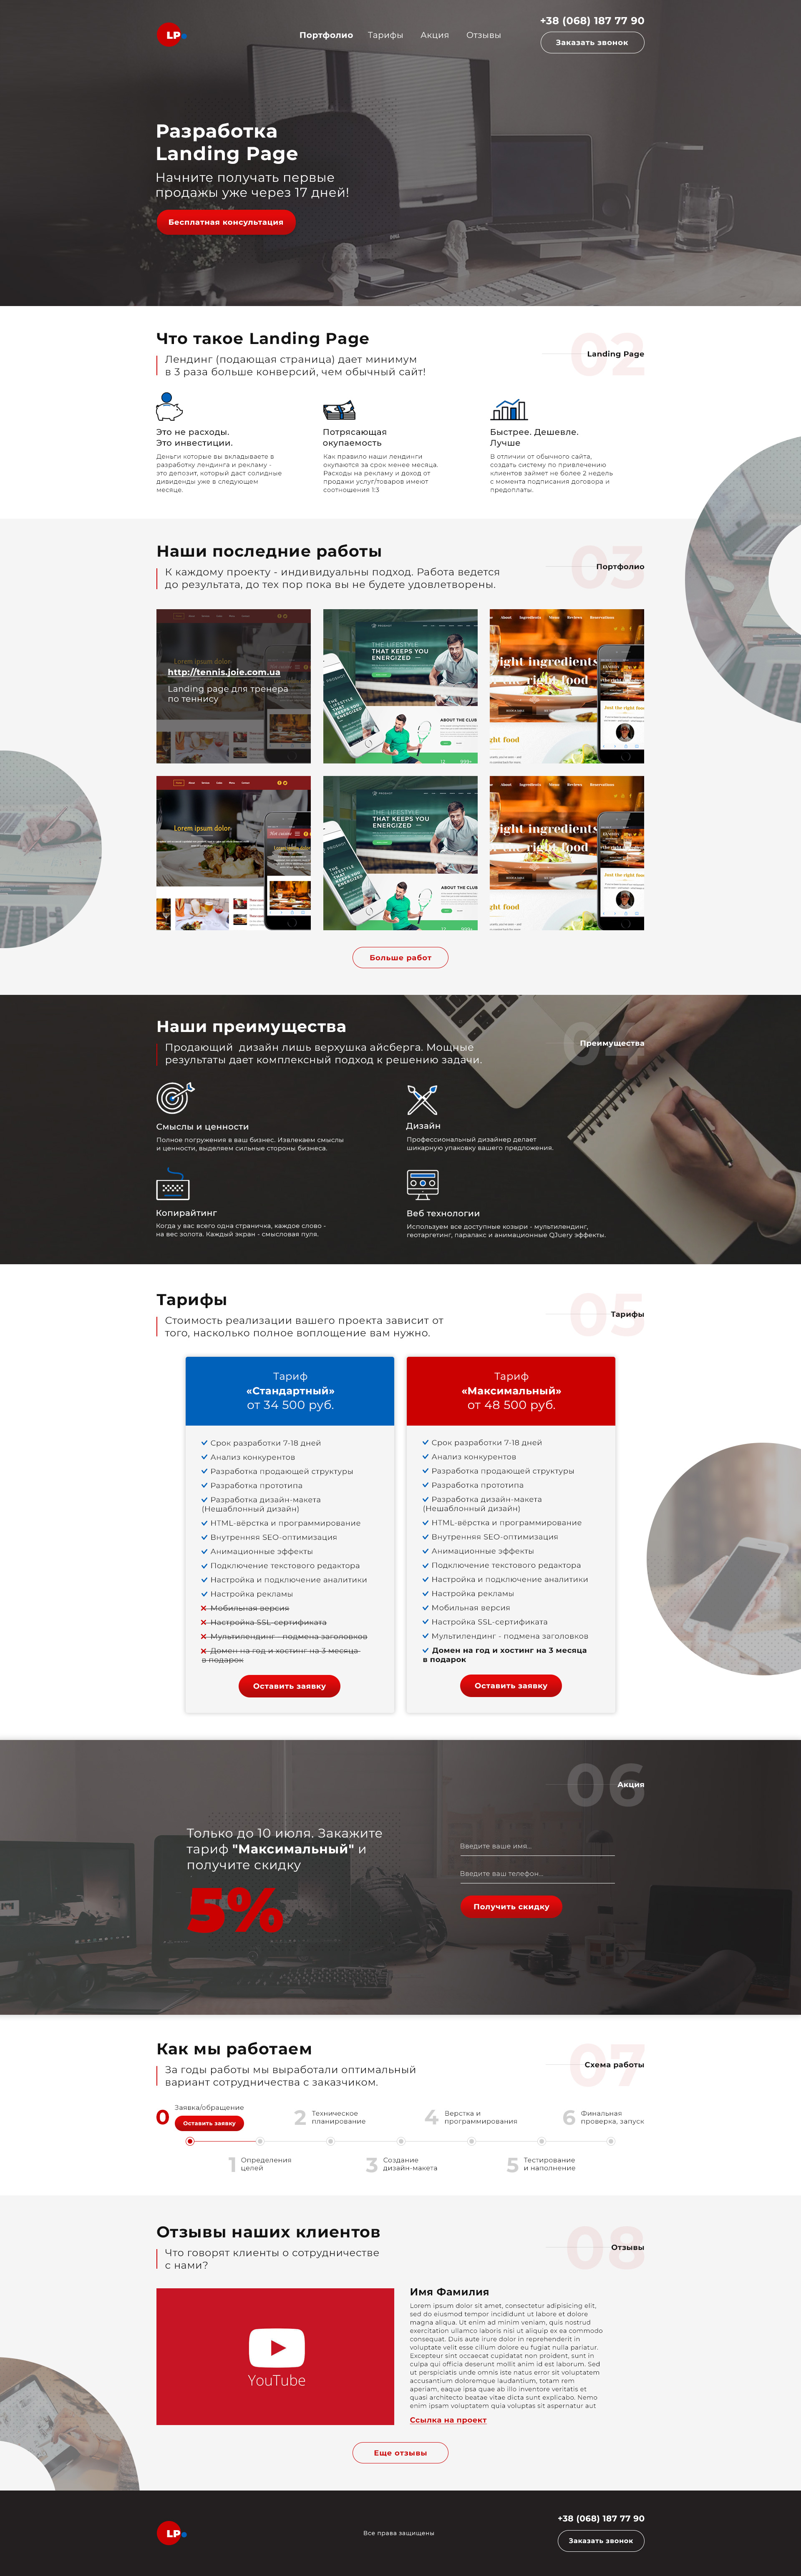 Web site preview